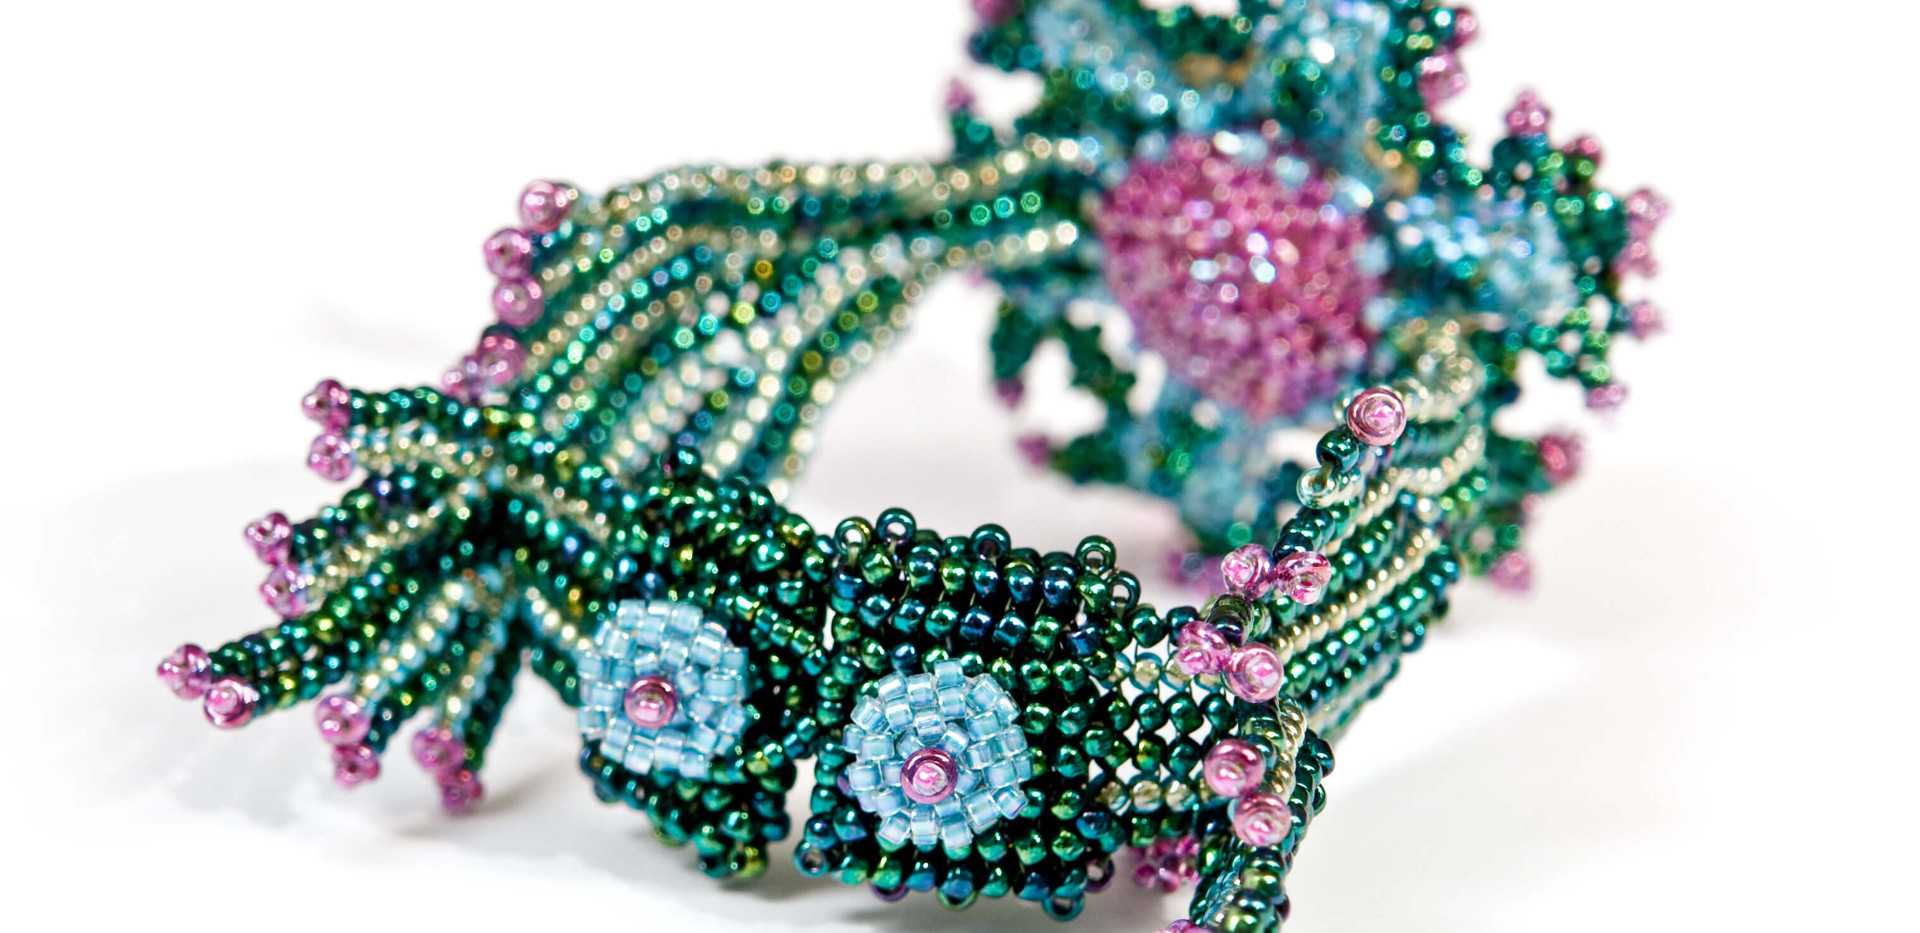 Starburst in Turquoise & Fuchsia